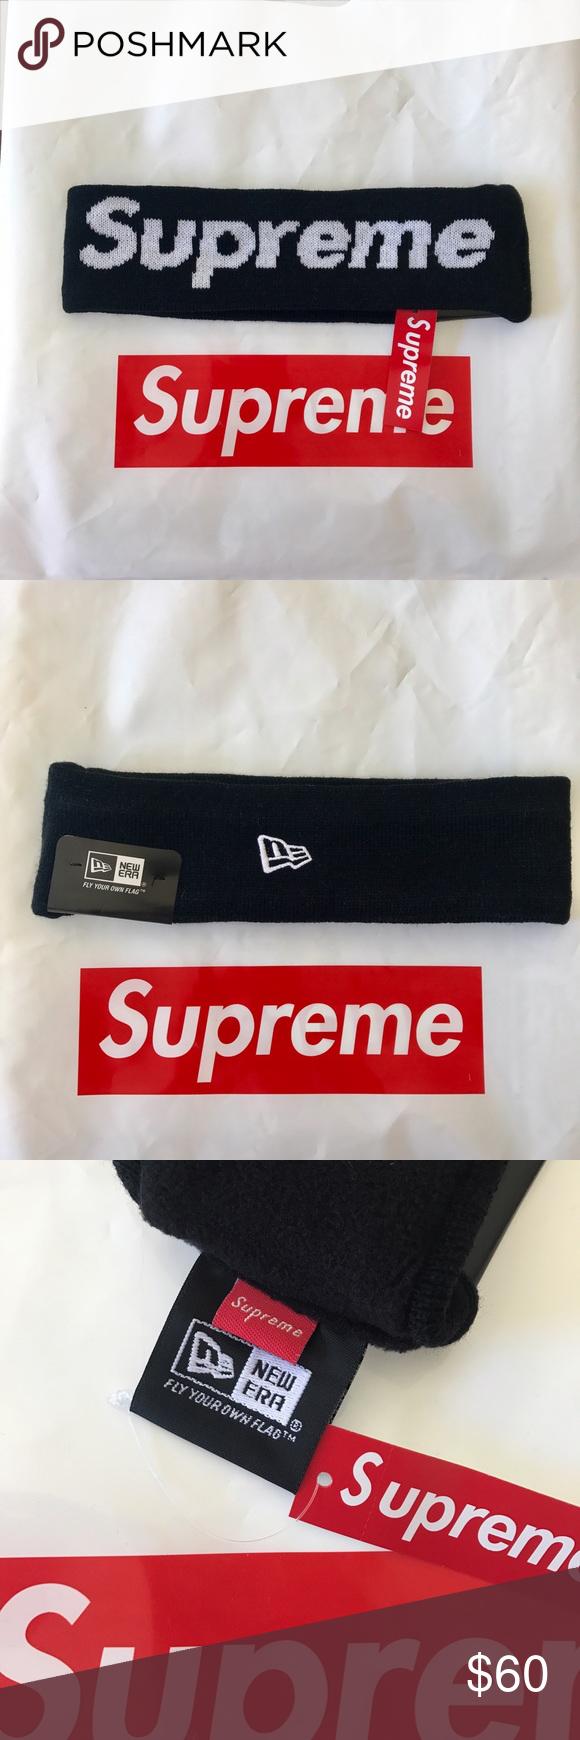 Black Supreme Headband Brand New 100 Authentic Supreme Accessories Hats Supreme Accessories Supreme Clothes Design